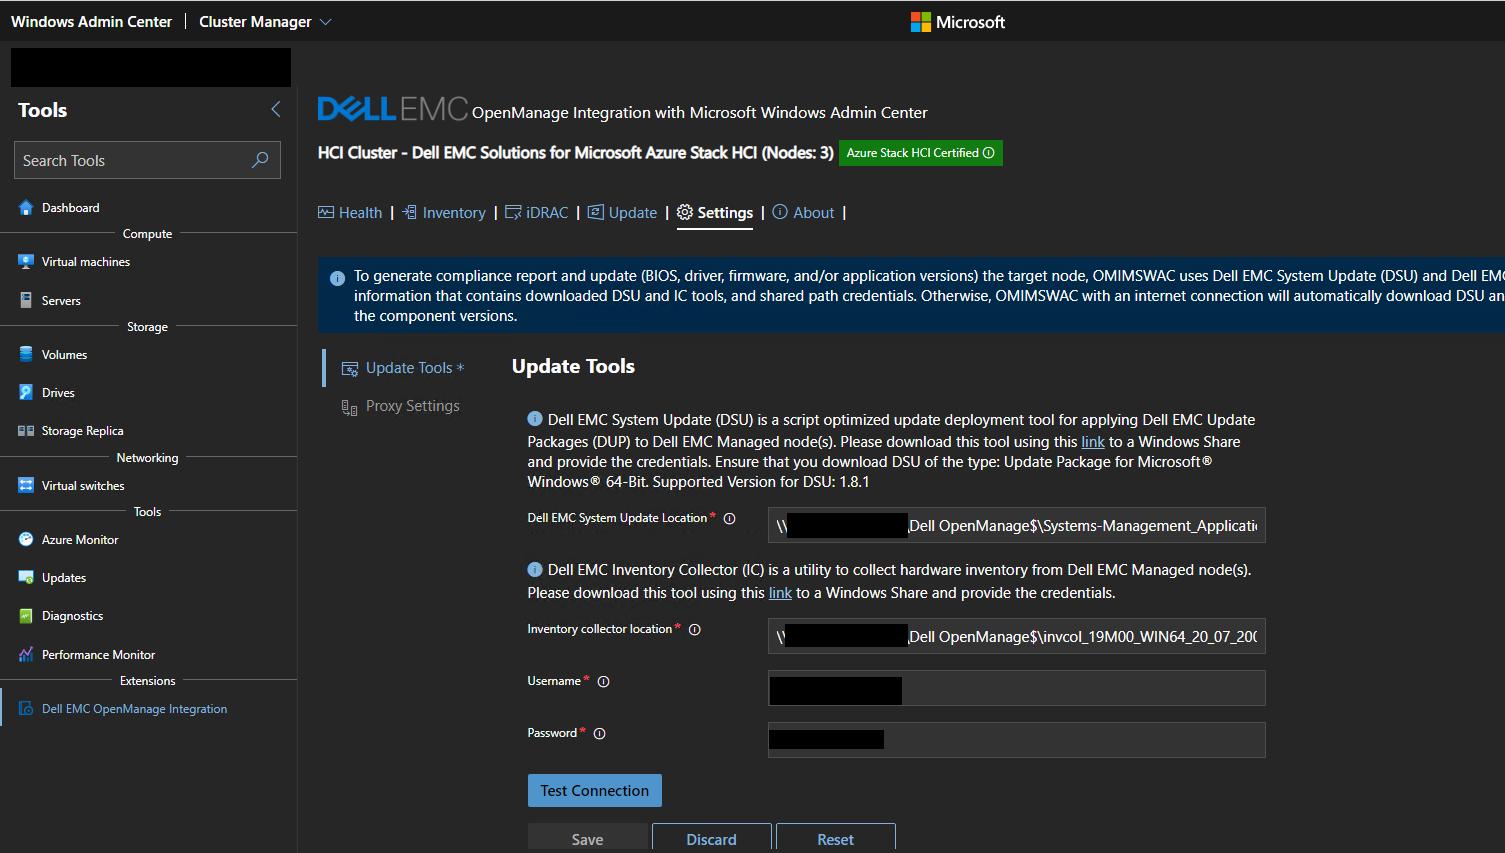 Dell EMC System Update (DSU)